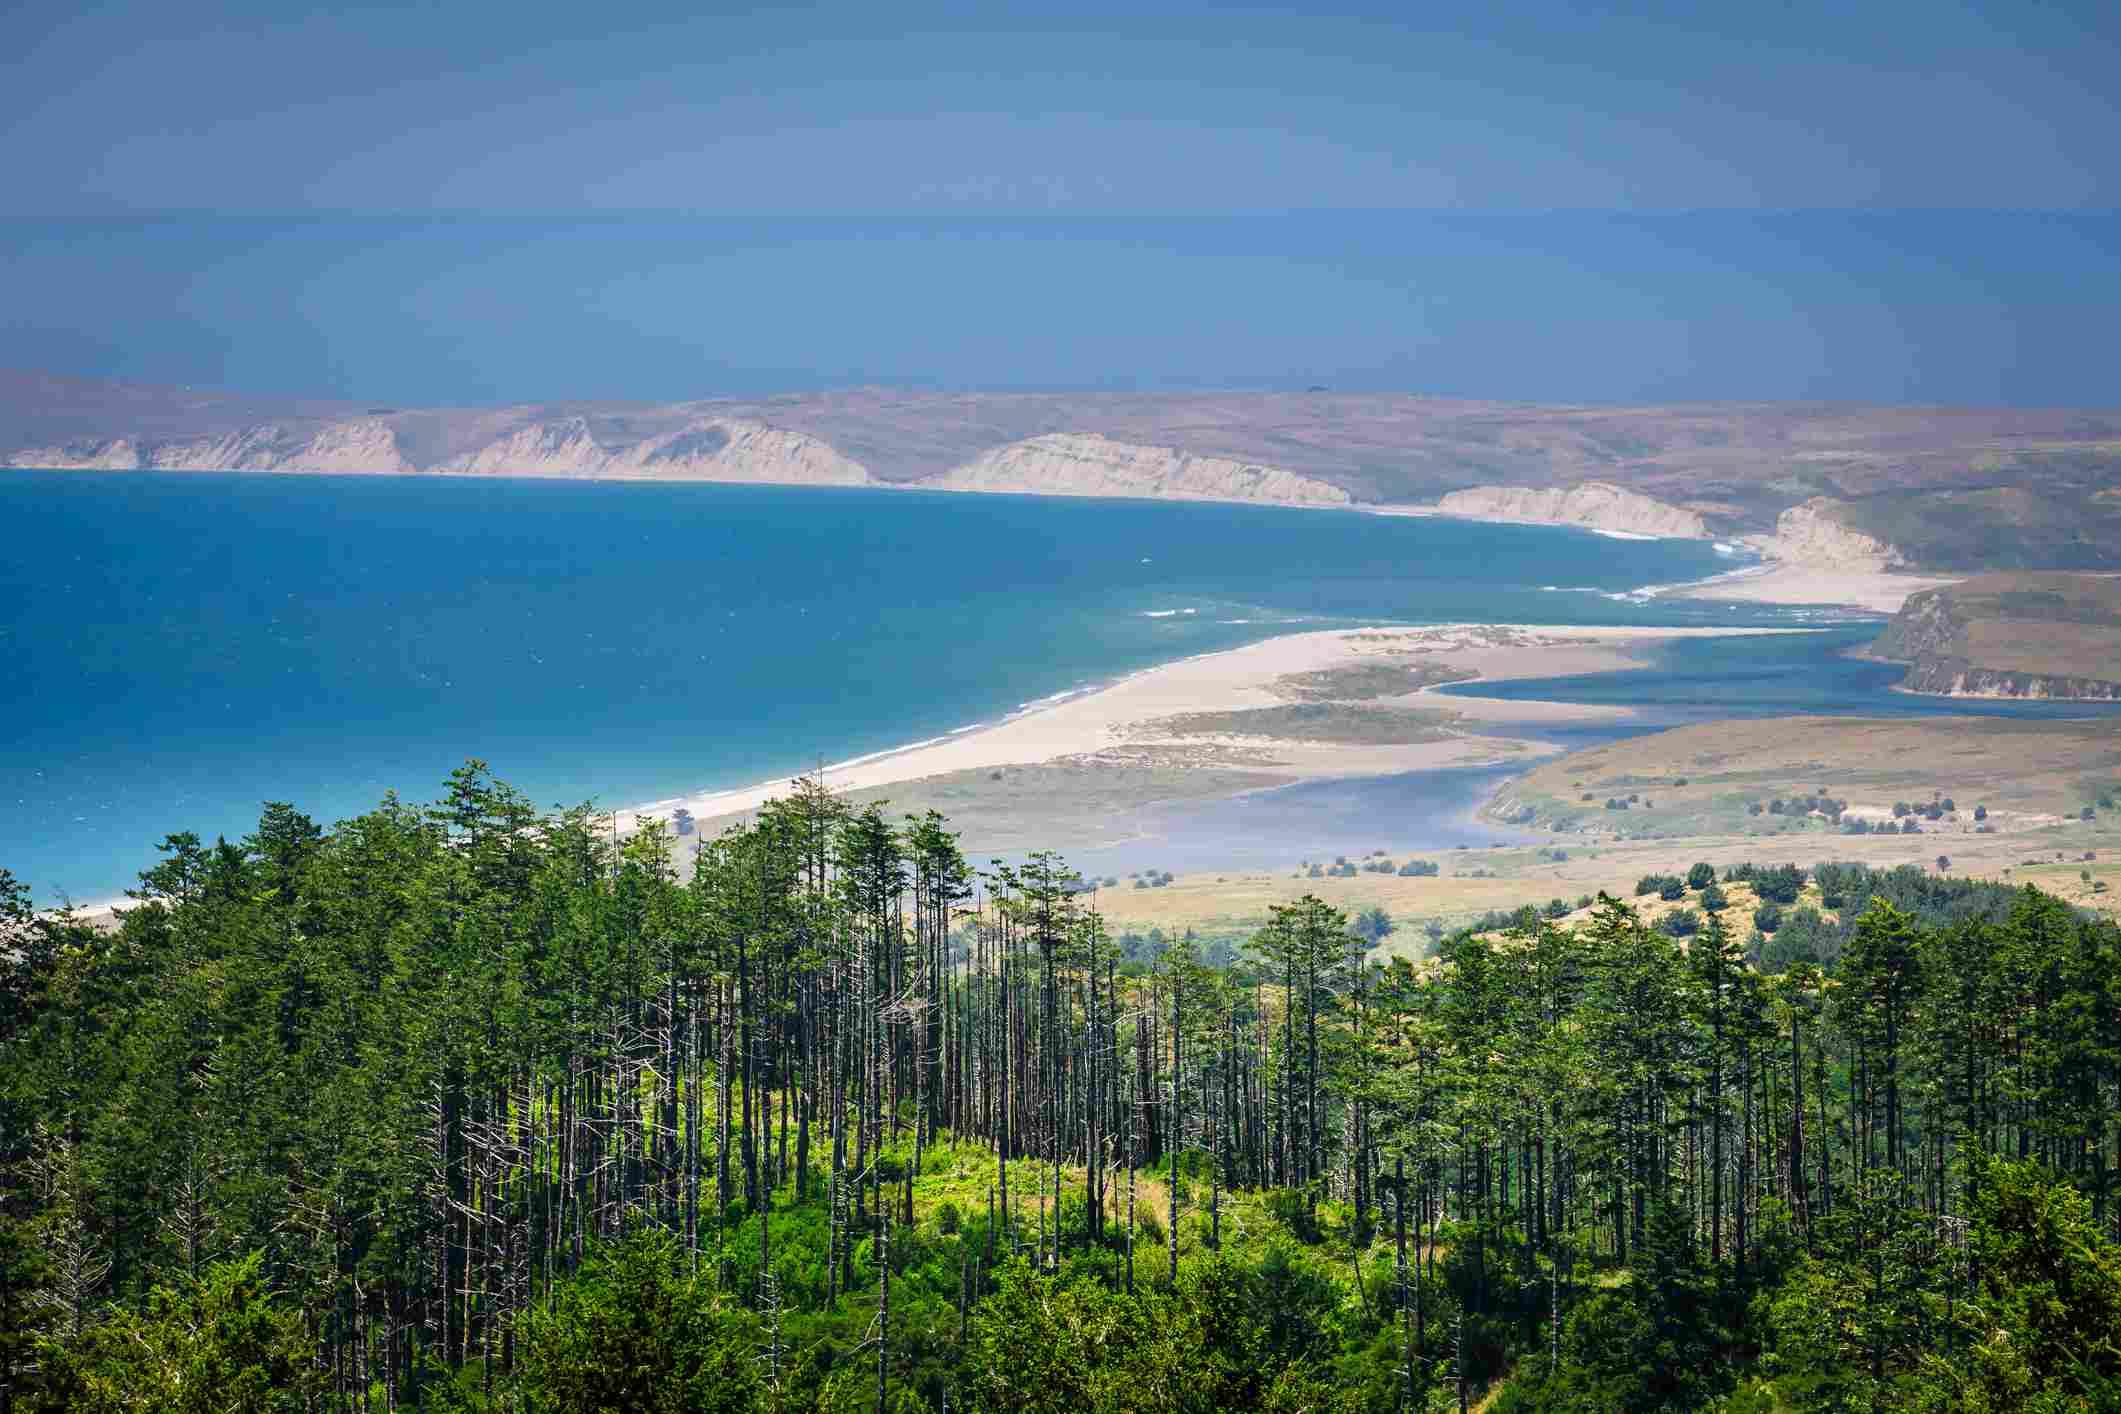 Point Reyes: Limantour Beach & Drakes Beach Cliffs